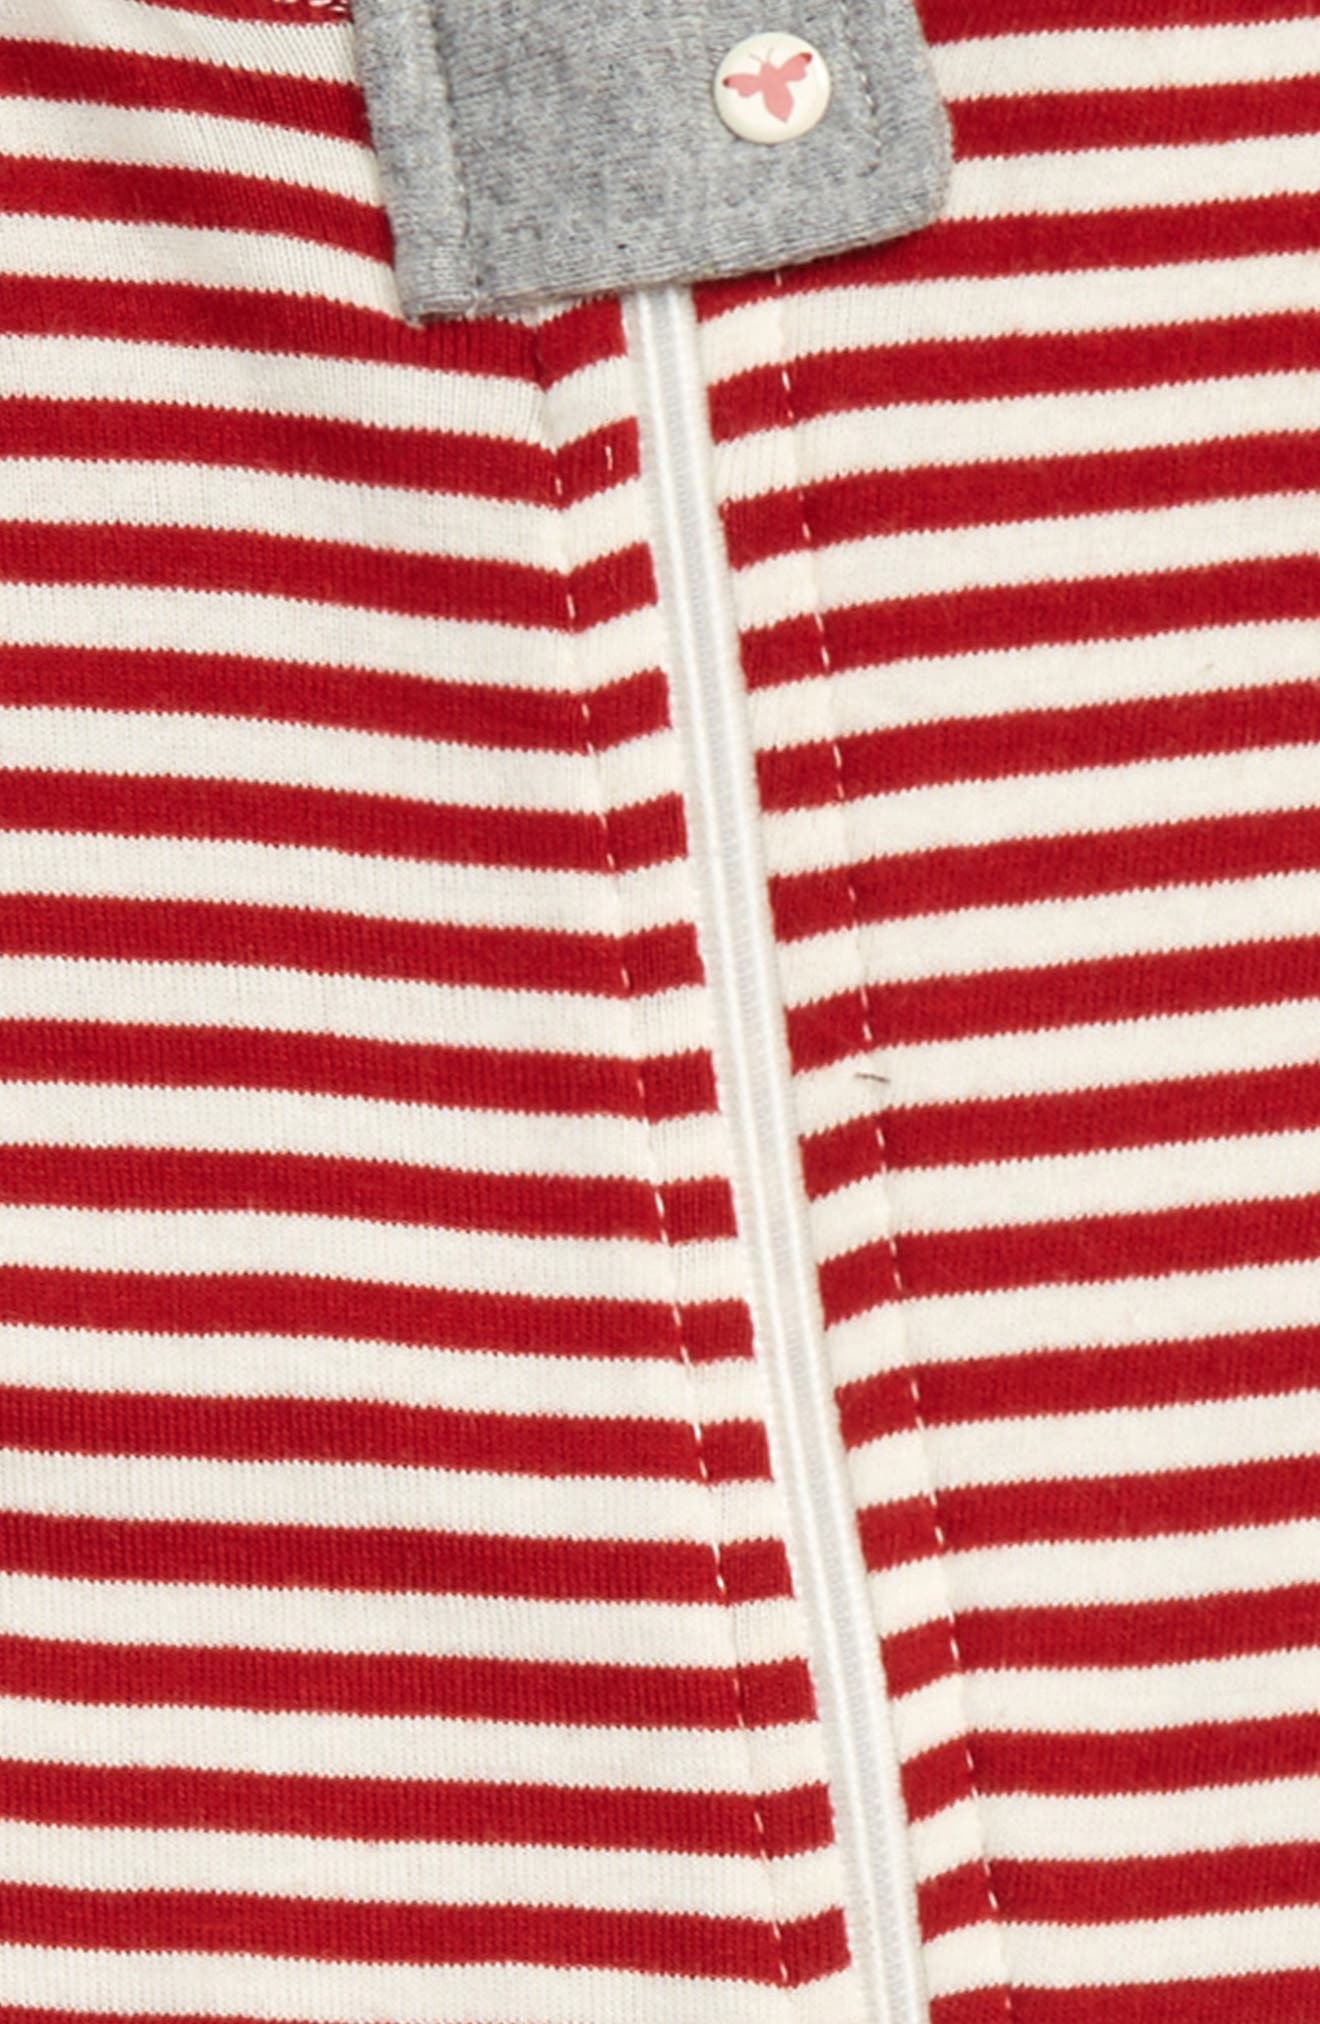 Alternate Image 2  - Burt's Bees Baby Fitted One-Piece Footie Pajamas (Baby)